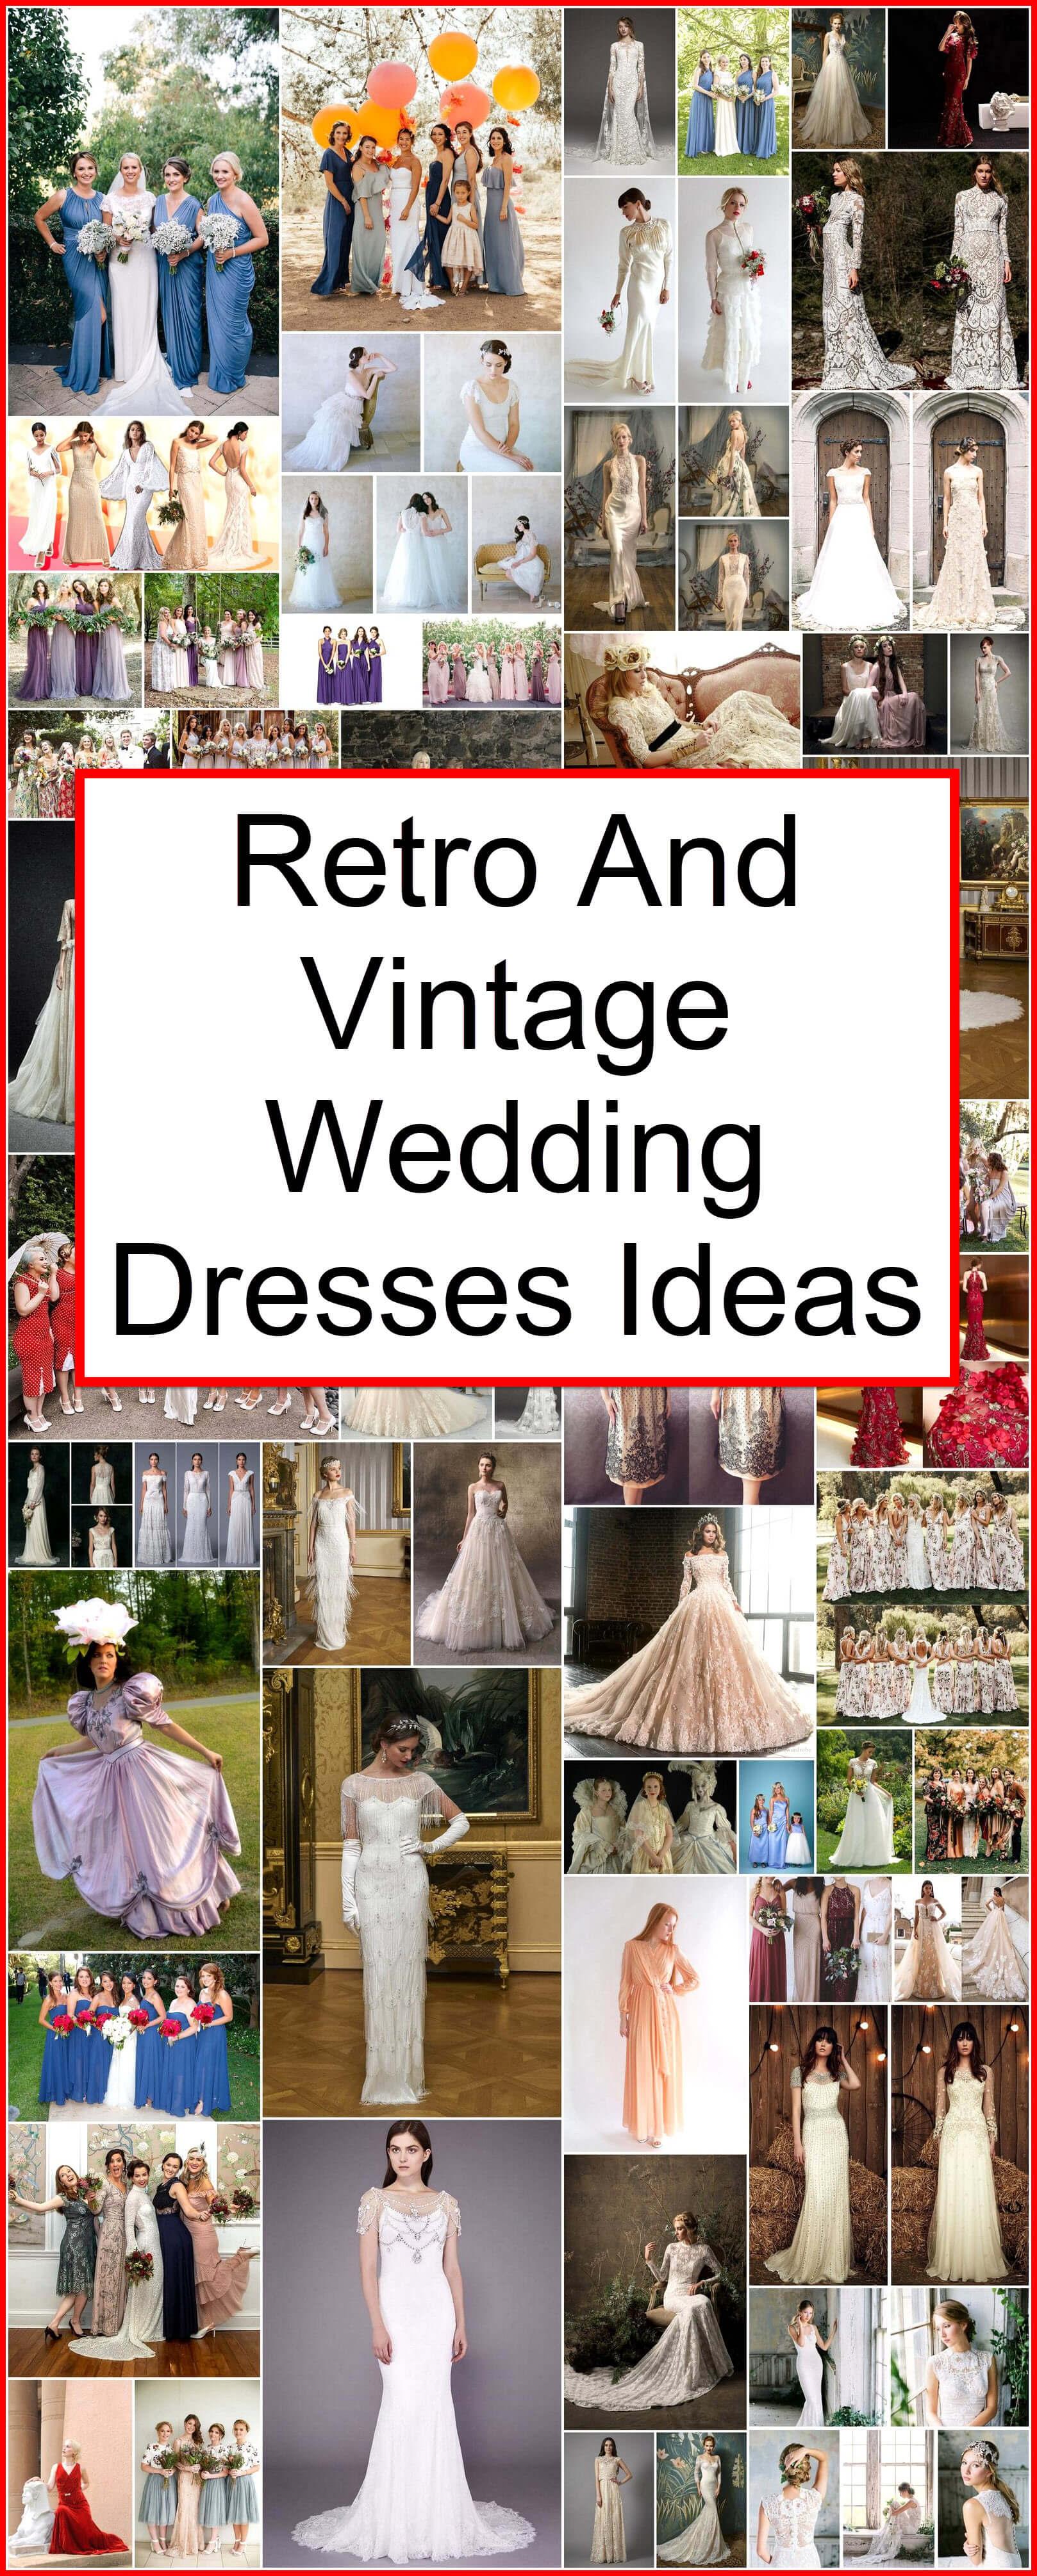 Retro And Vintage Wedding Dresses Ideas